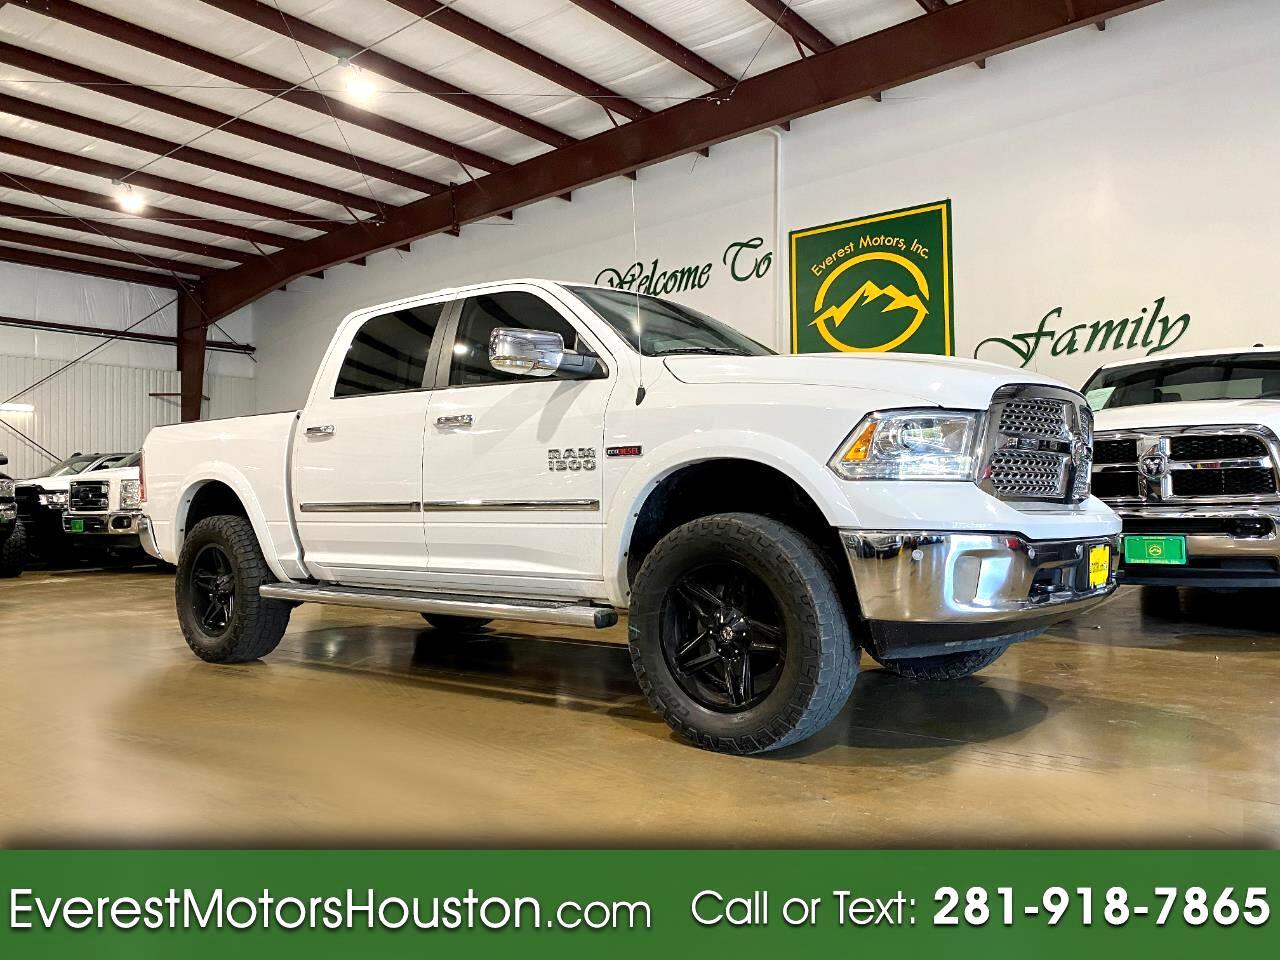 Used 2015 Dodge Ram 1500 Laramie Crew Cab 4x2 Diesel For Sale In Houston Tx 77031 Everest Motors Inc